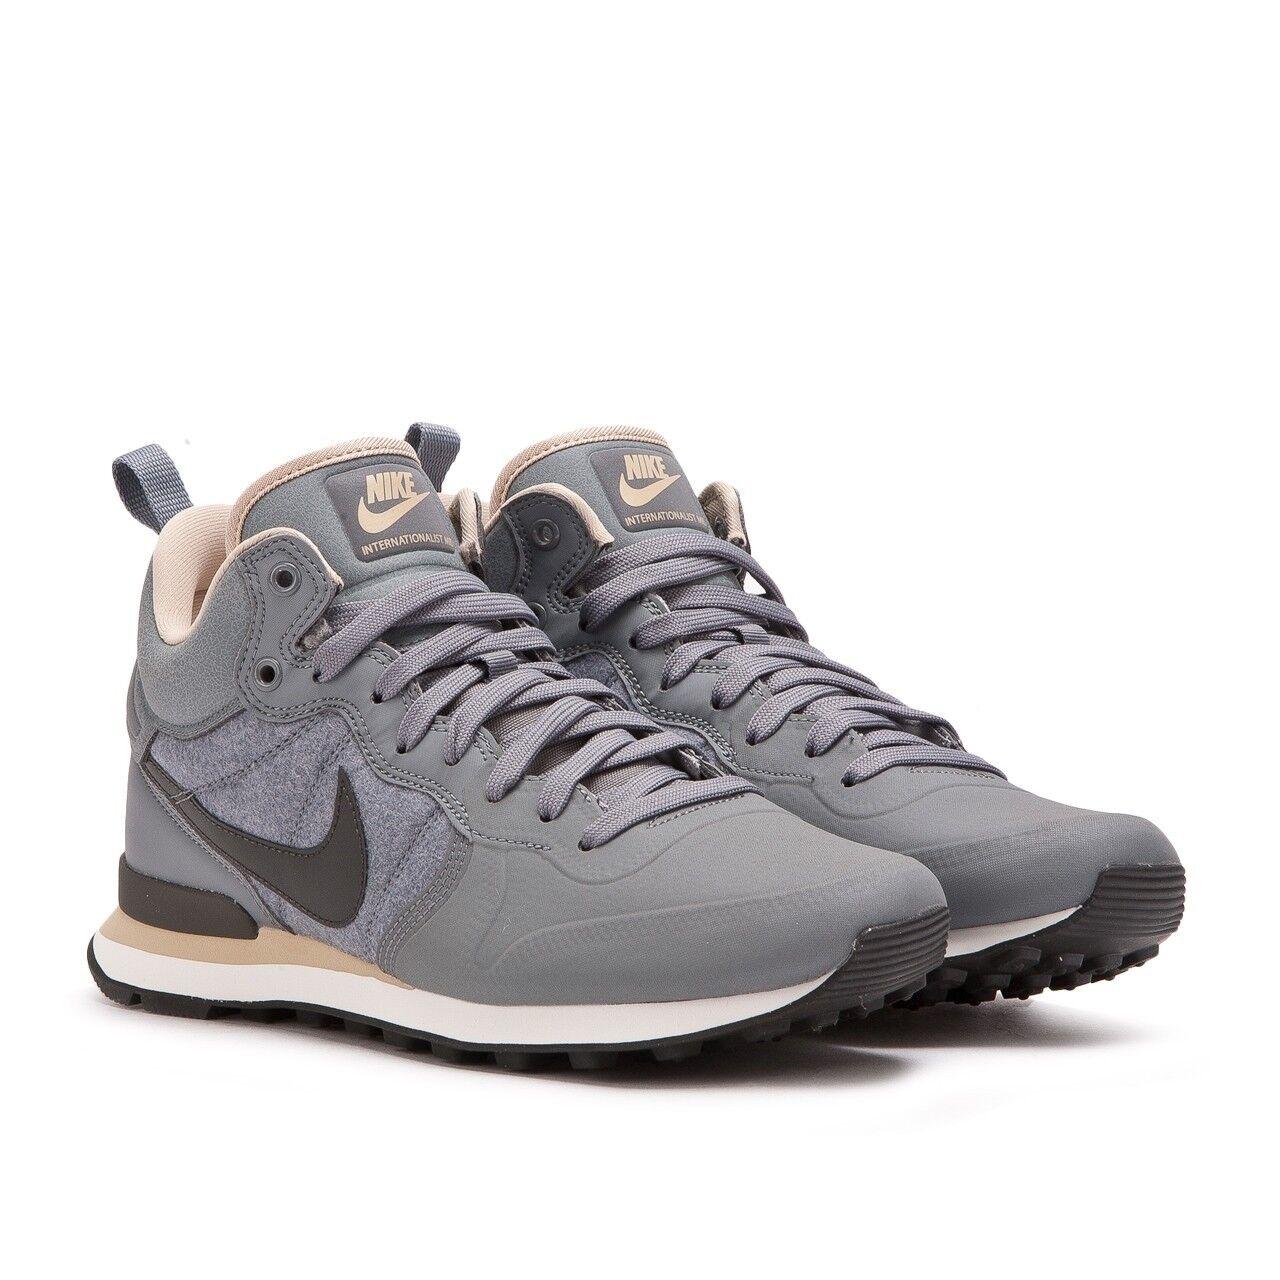 Nike Internationalist Utility Wool size 9.Grey Pewter. 857937-003. Brand discount